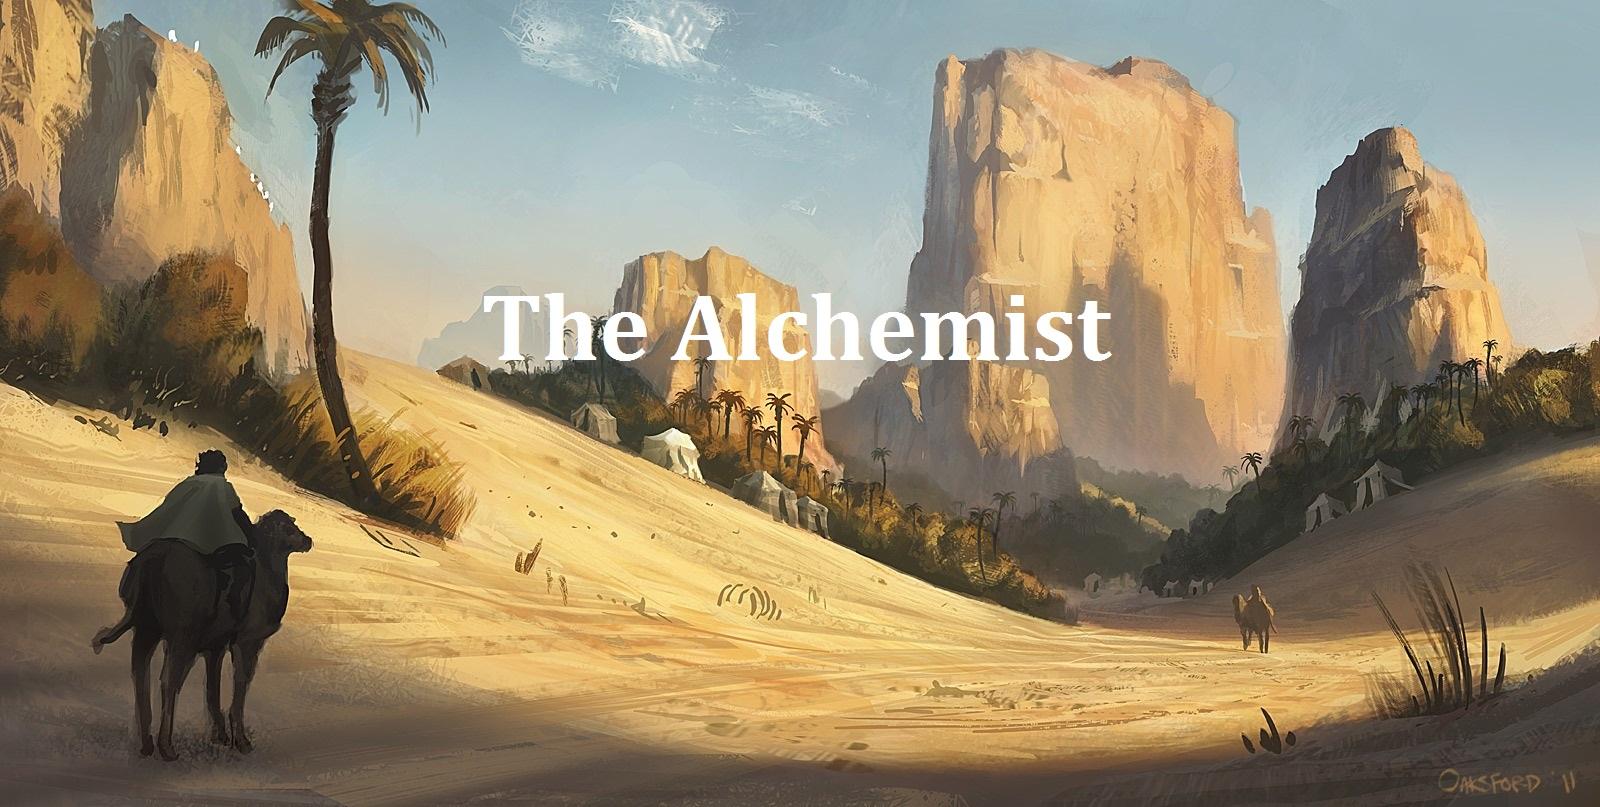 book review the alchemist sami naik cde8ac16cdfd38f4d737b5367bccc206